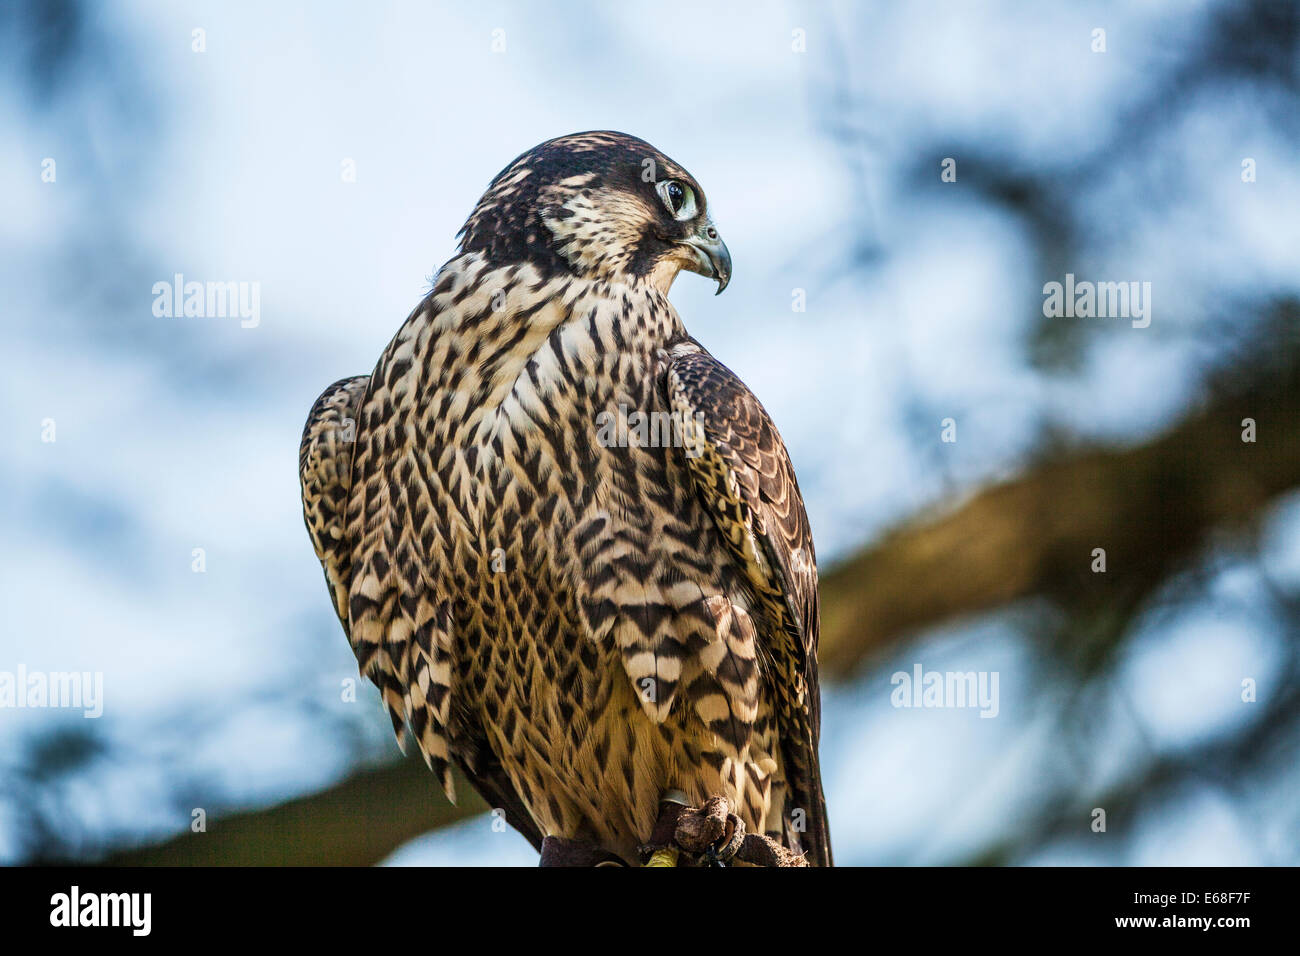 A captive peregrine falcon, Falco peregrinus - Stock Image